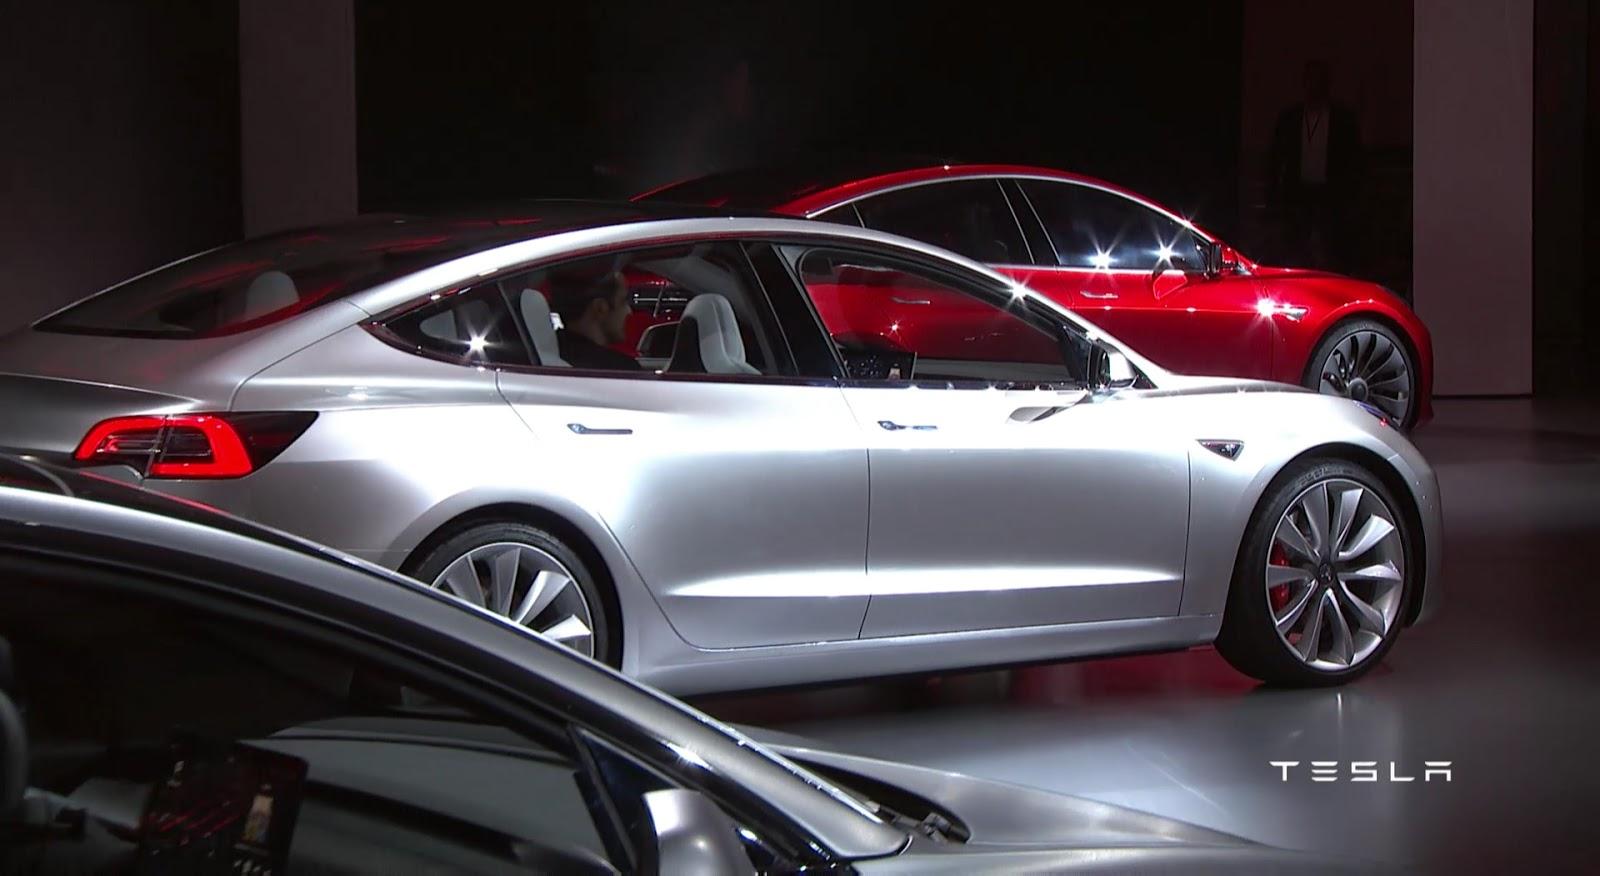 Tesla Better Start Hiring Experienced Automotive Engineers ...